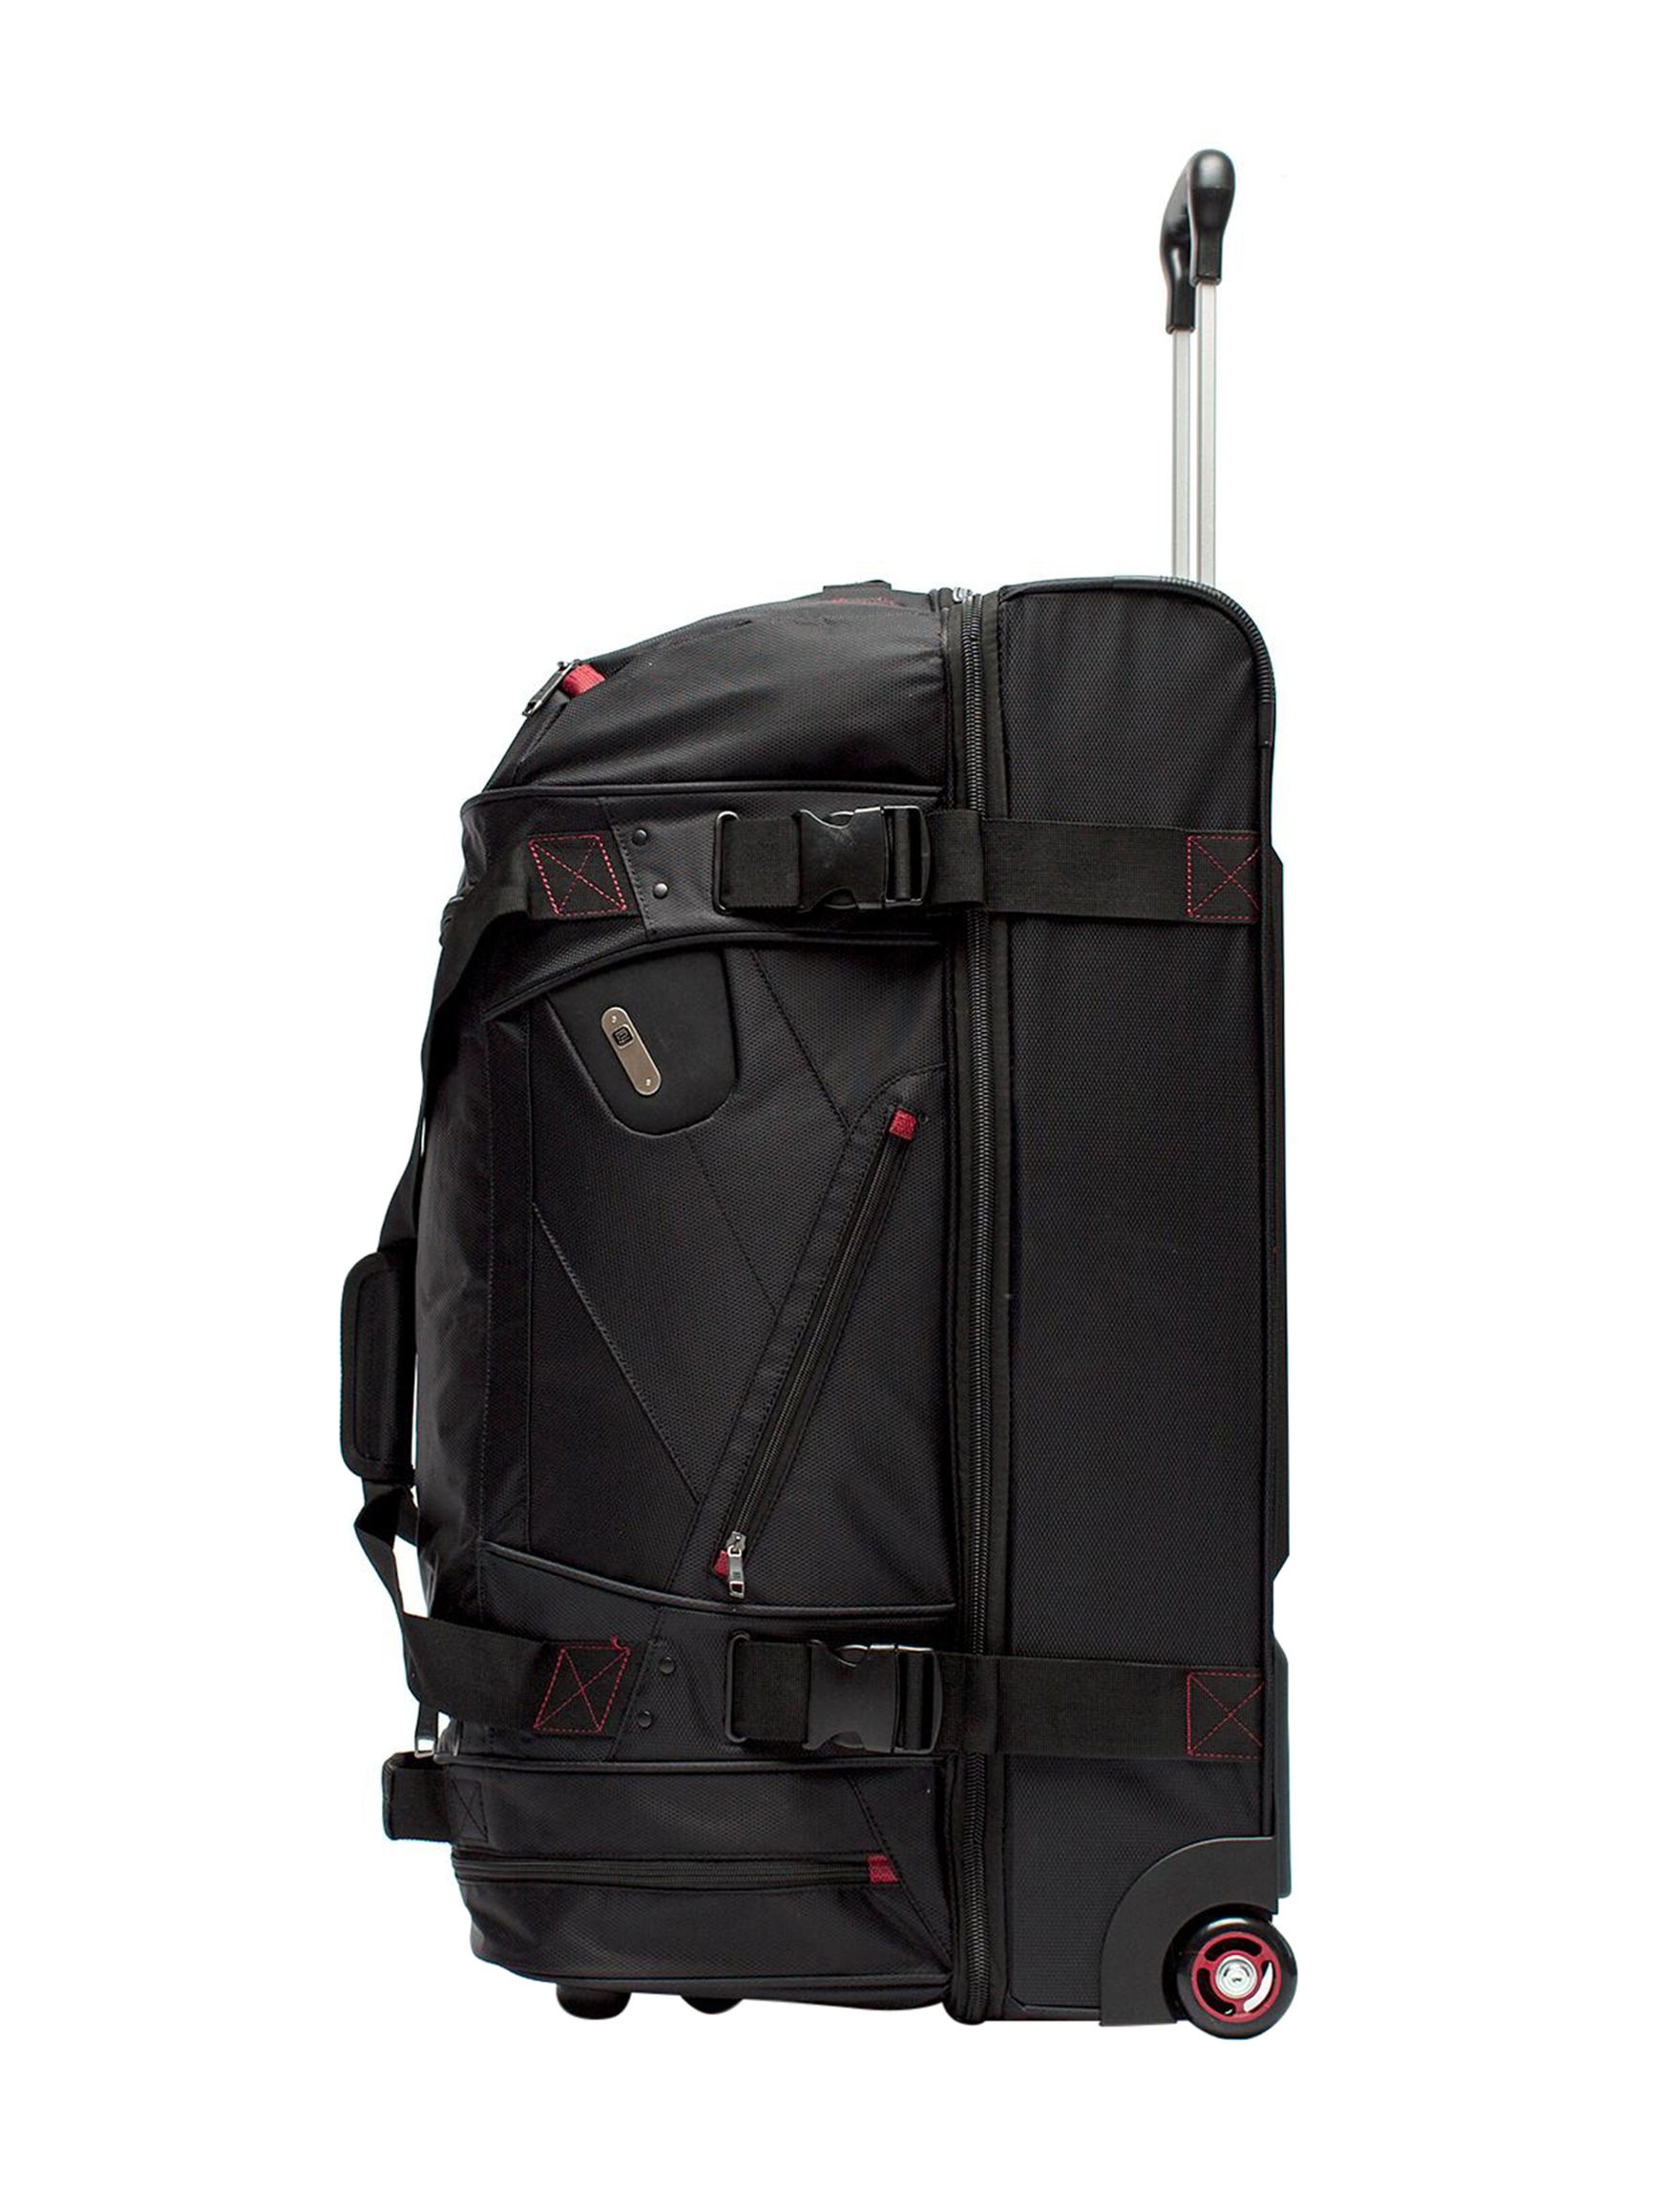 Ful Black Duffle Bags